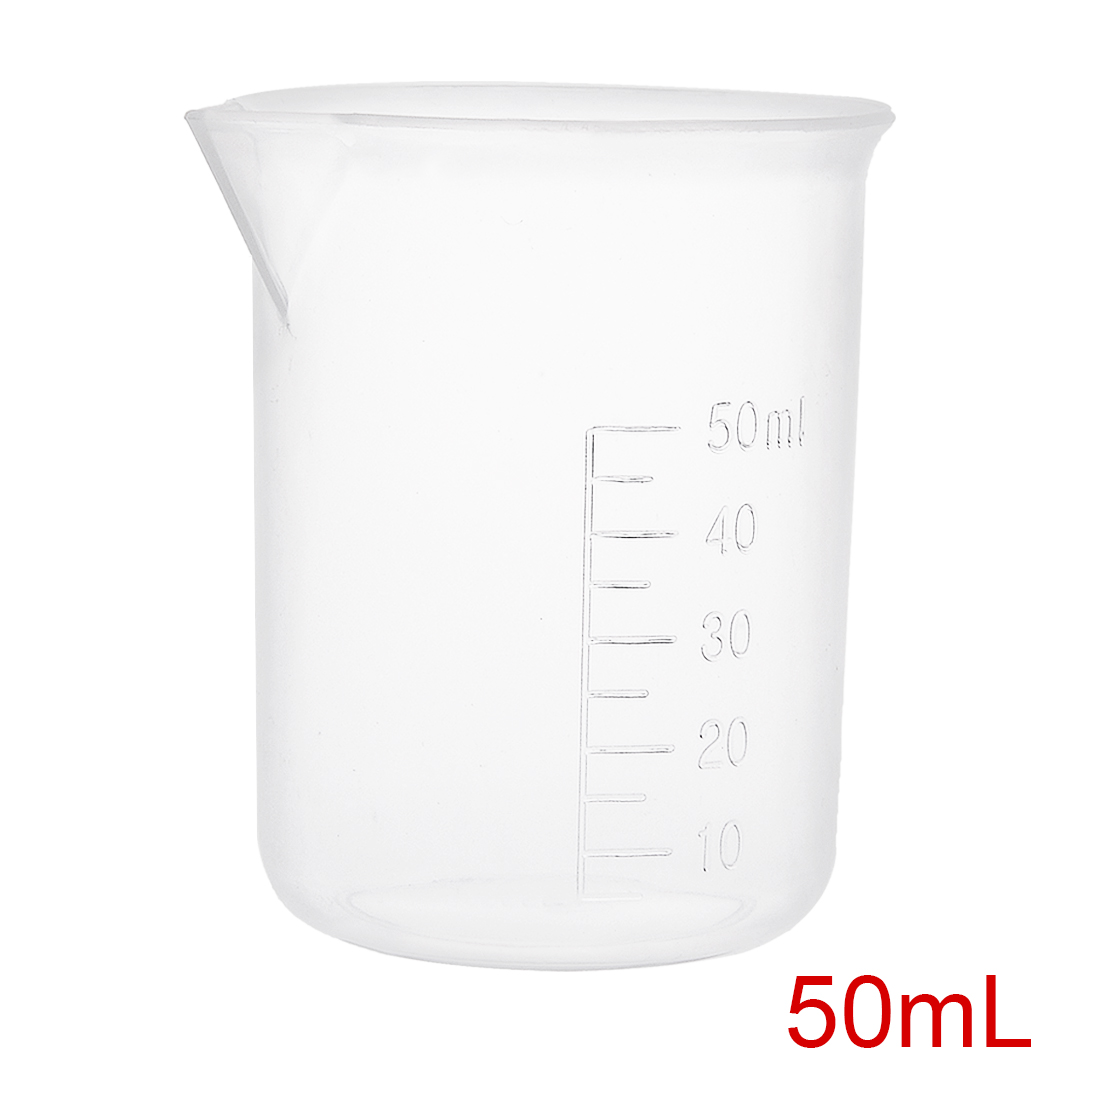 2pcs Measuring Cup Labs PP Graduated Beakers 50ml by Unique-Bargains